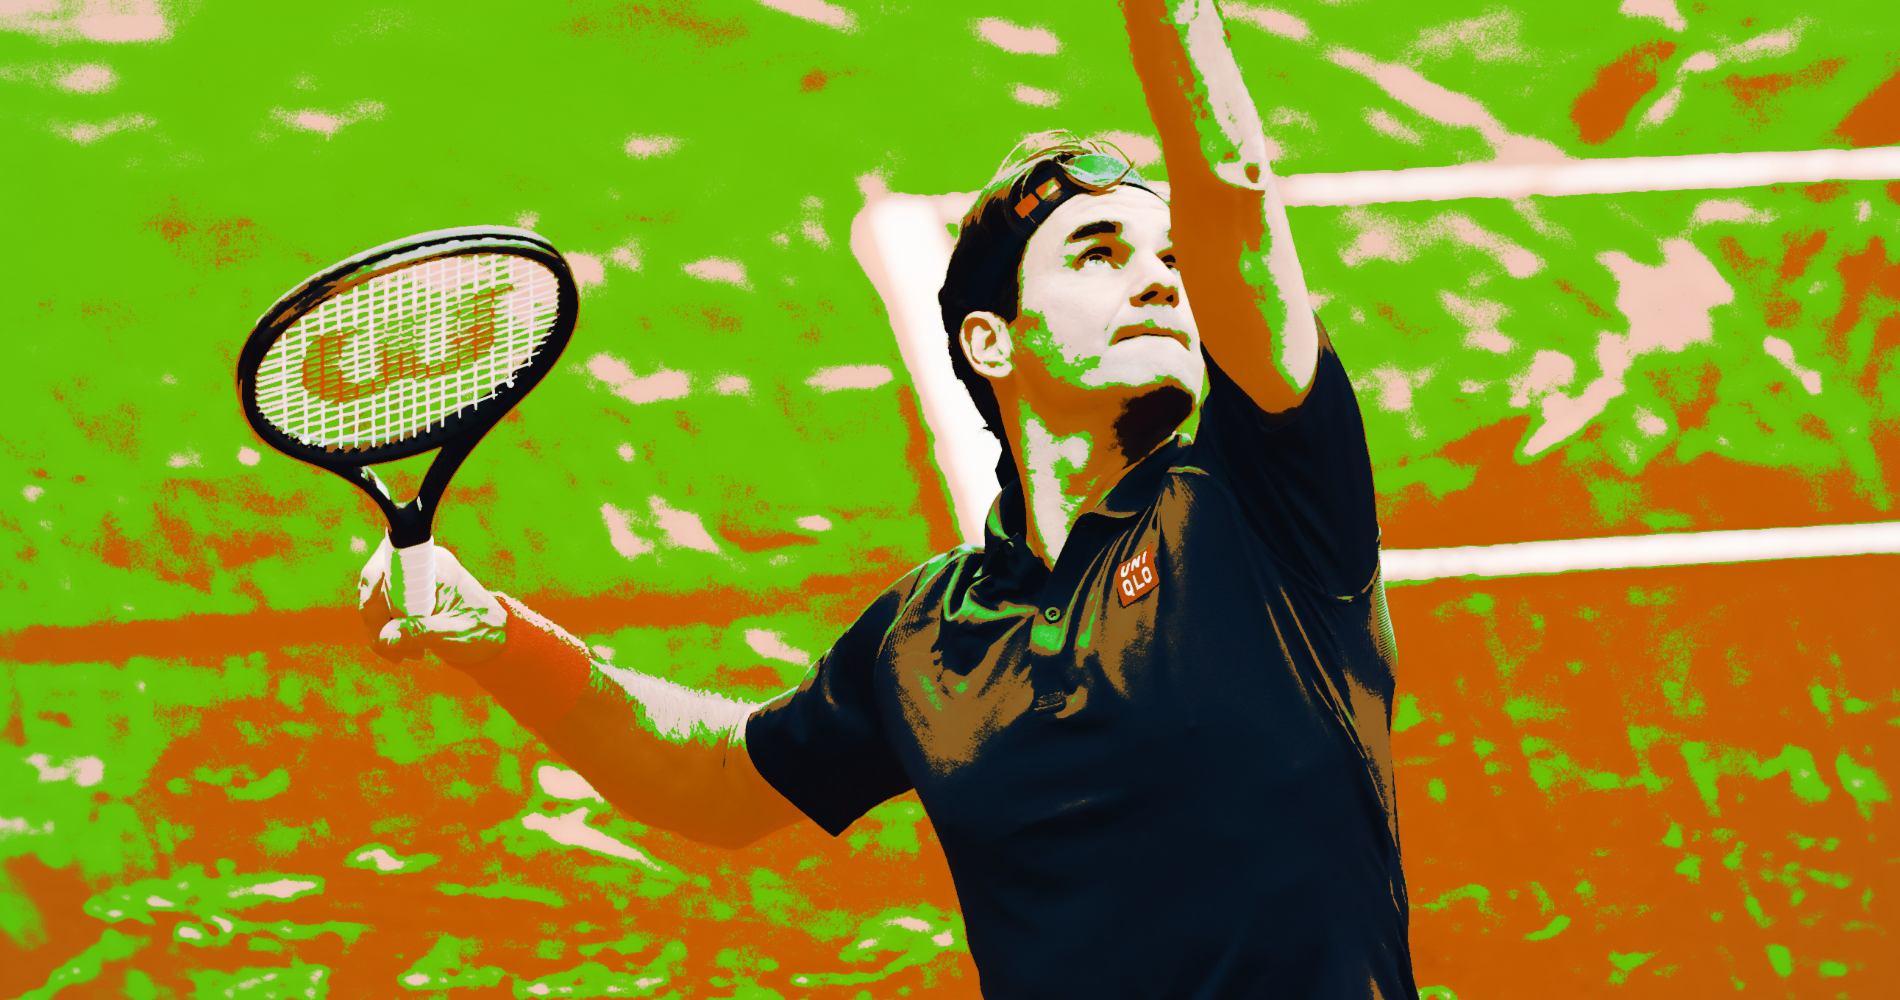 Roger Federer at Geneva in 2021